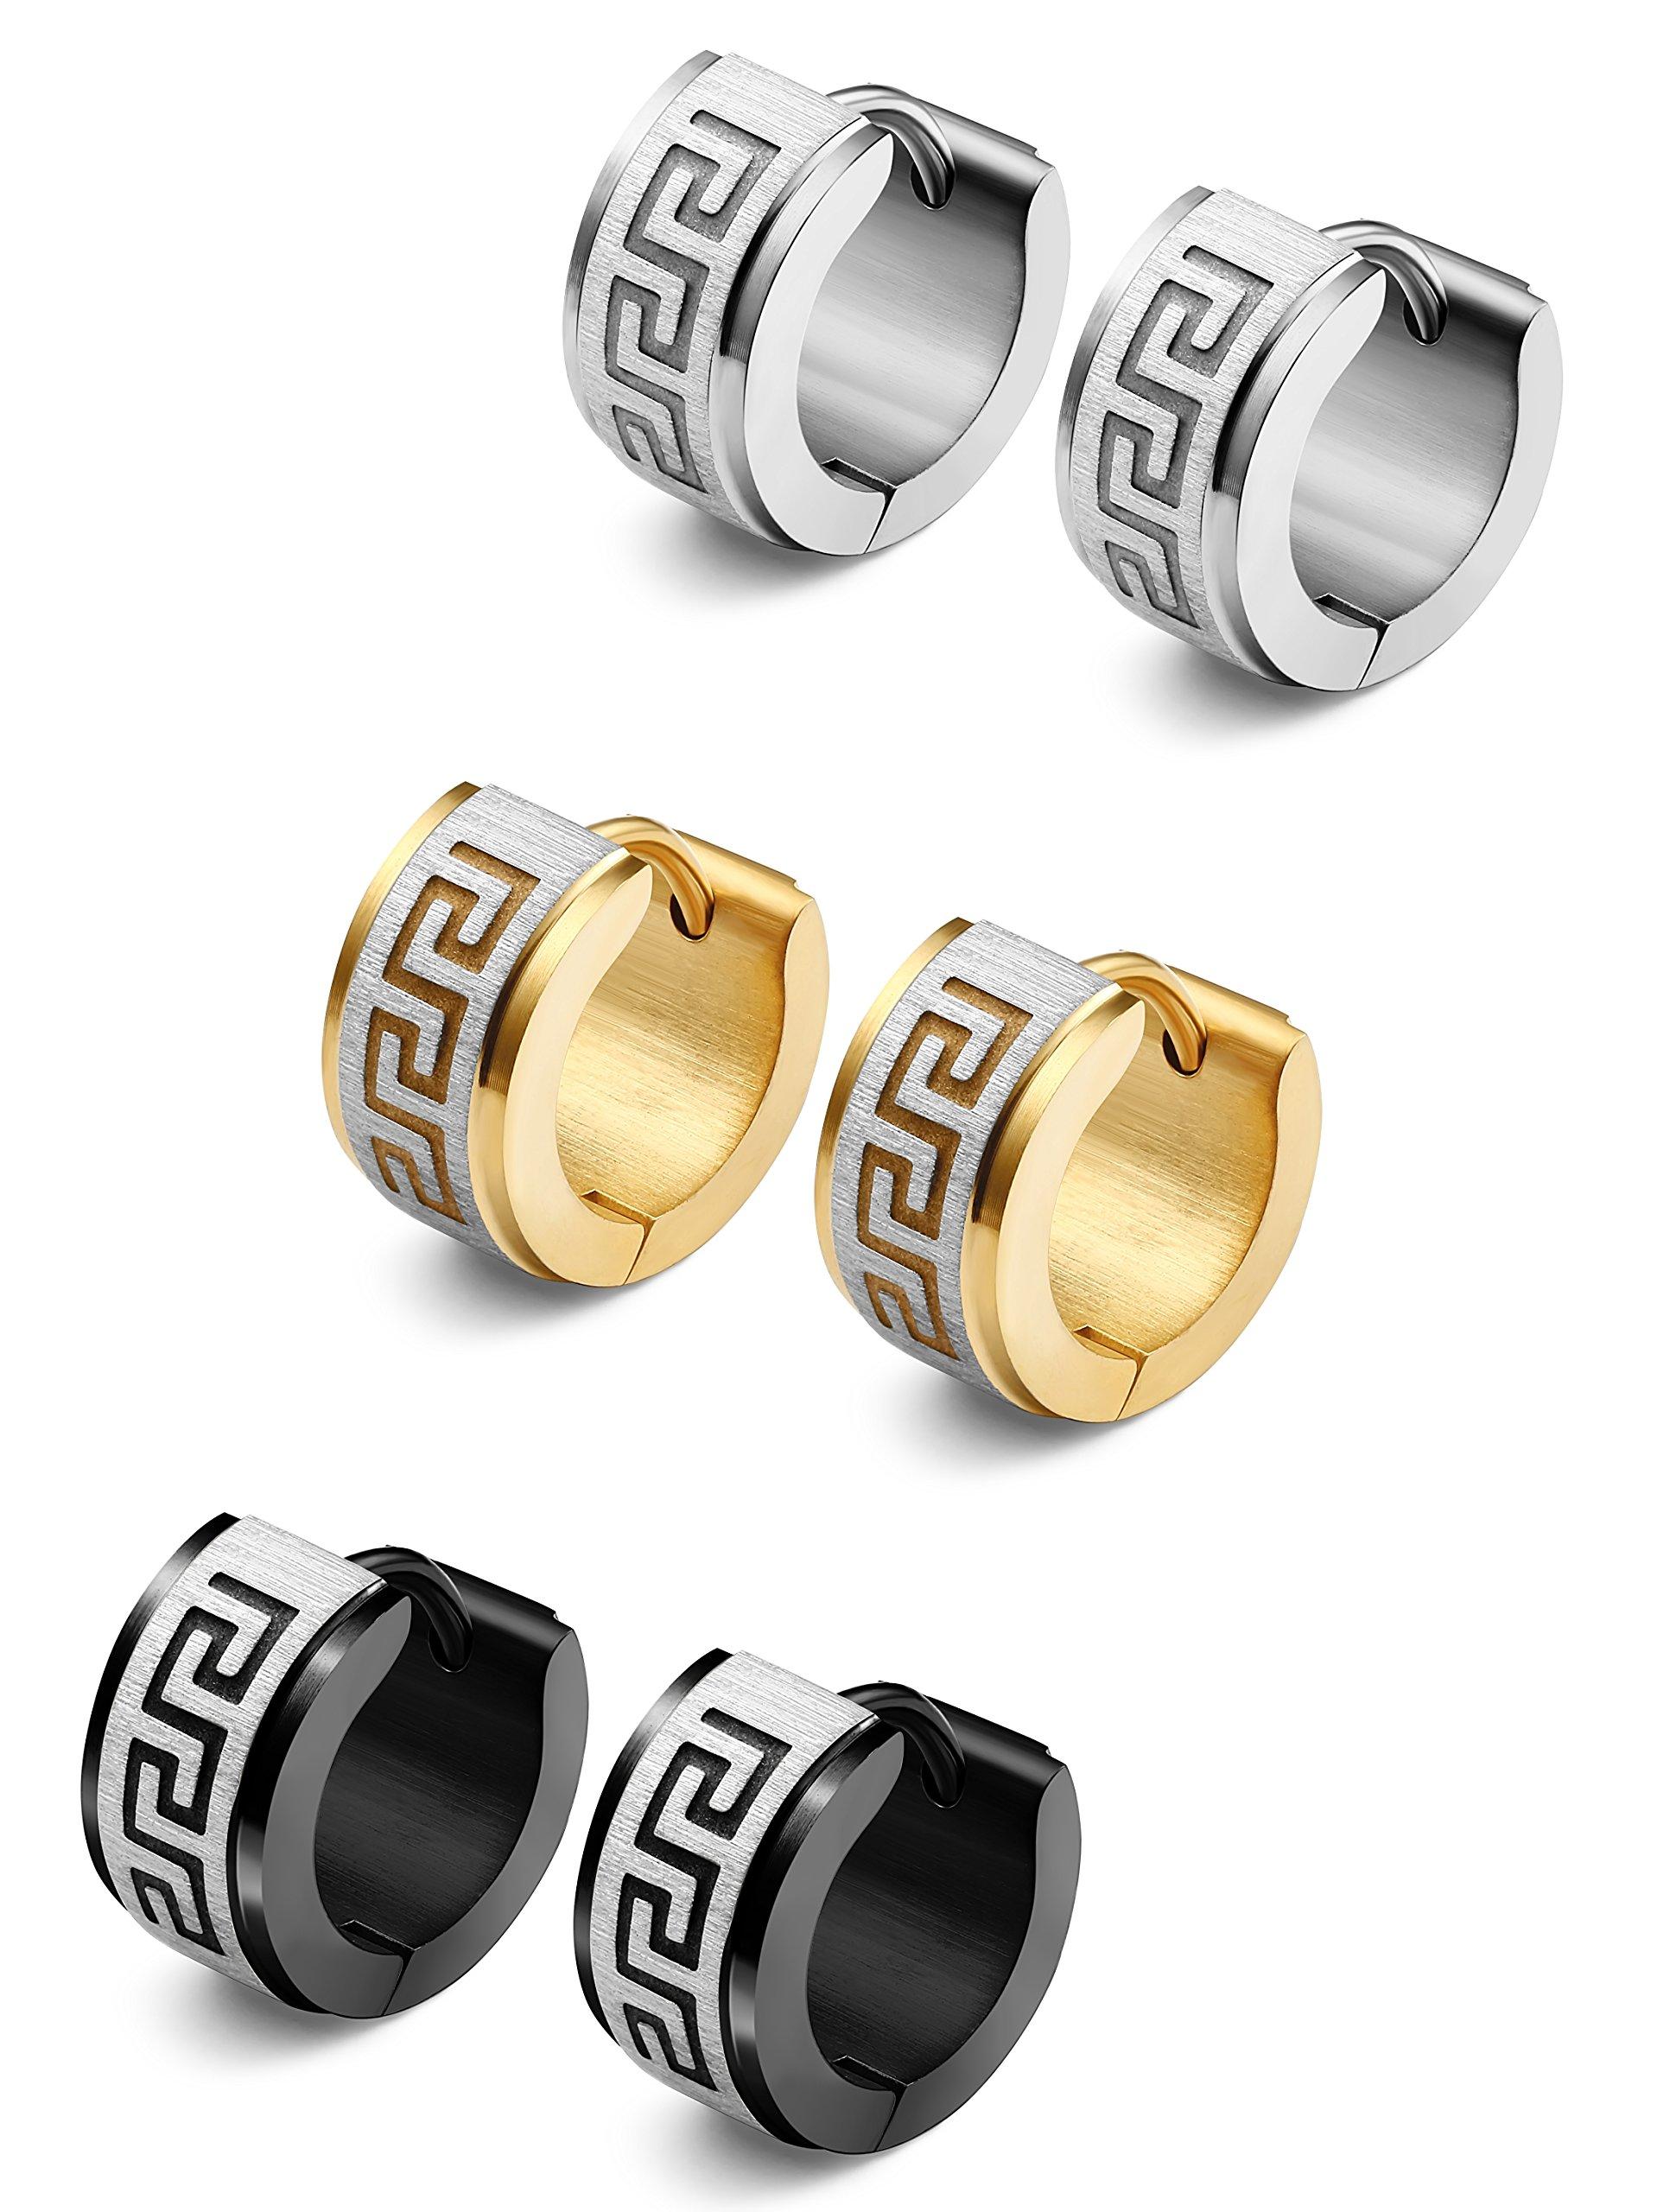 Jstyle Jewelry Stainless Steel Hoop Earrings for Men Women Huggie Earrings Unique Greek Key 3 Pairs S